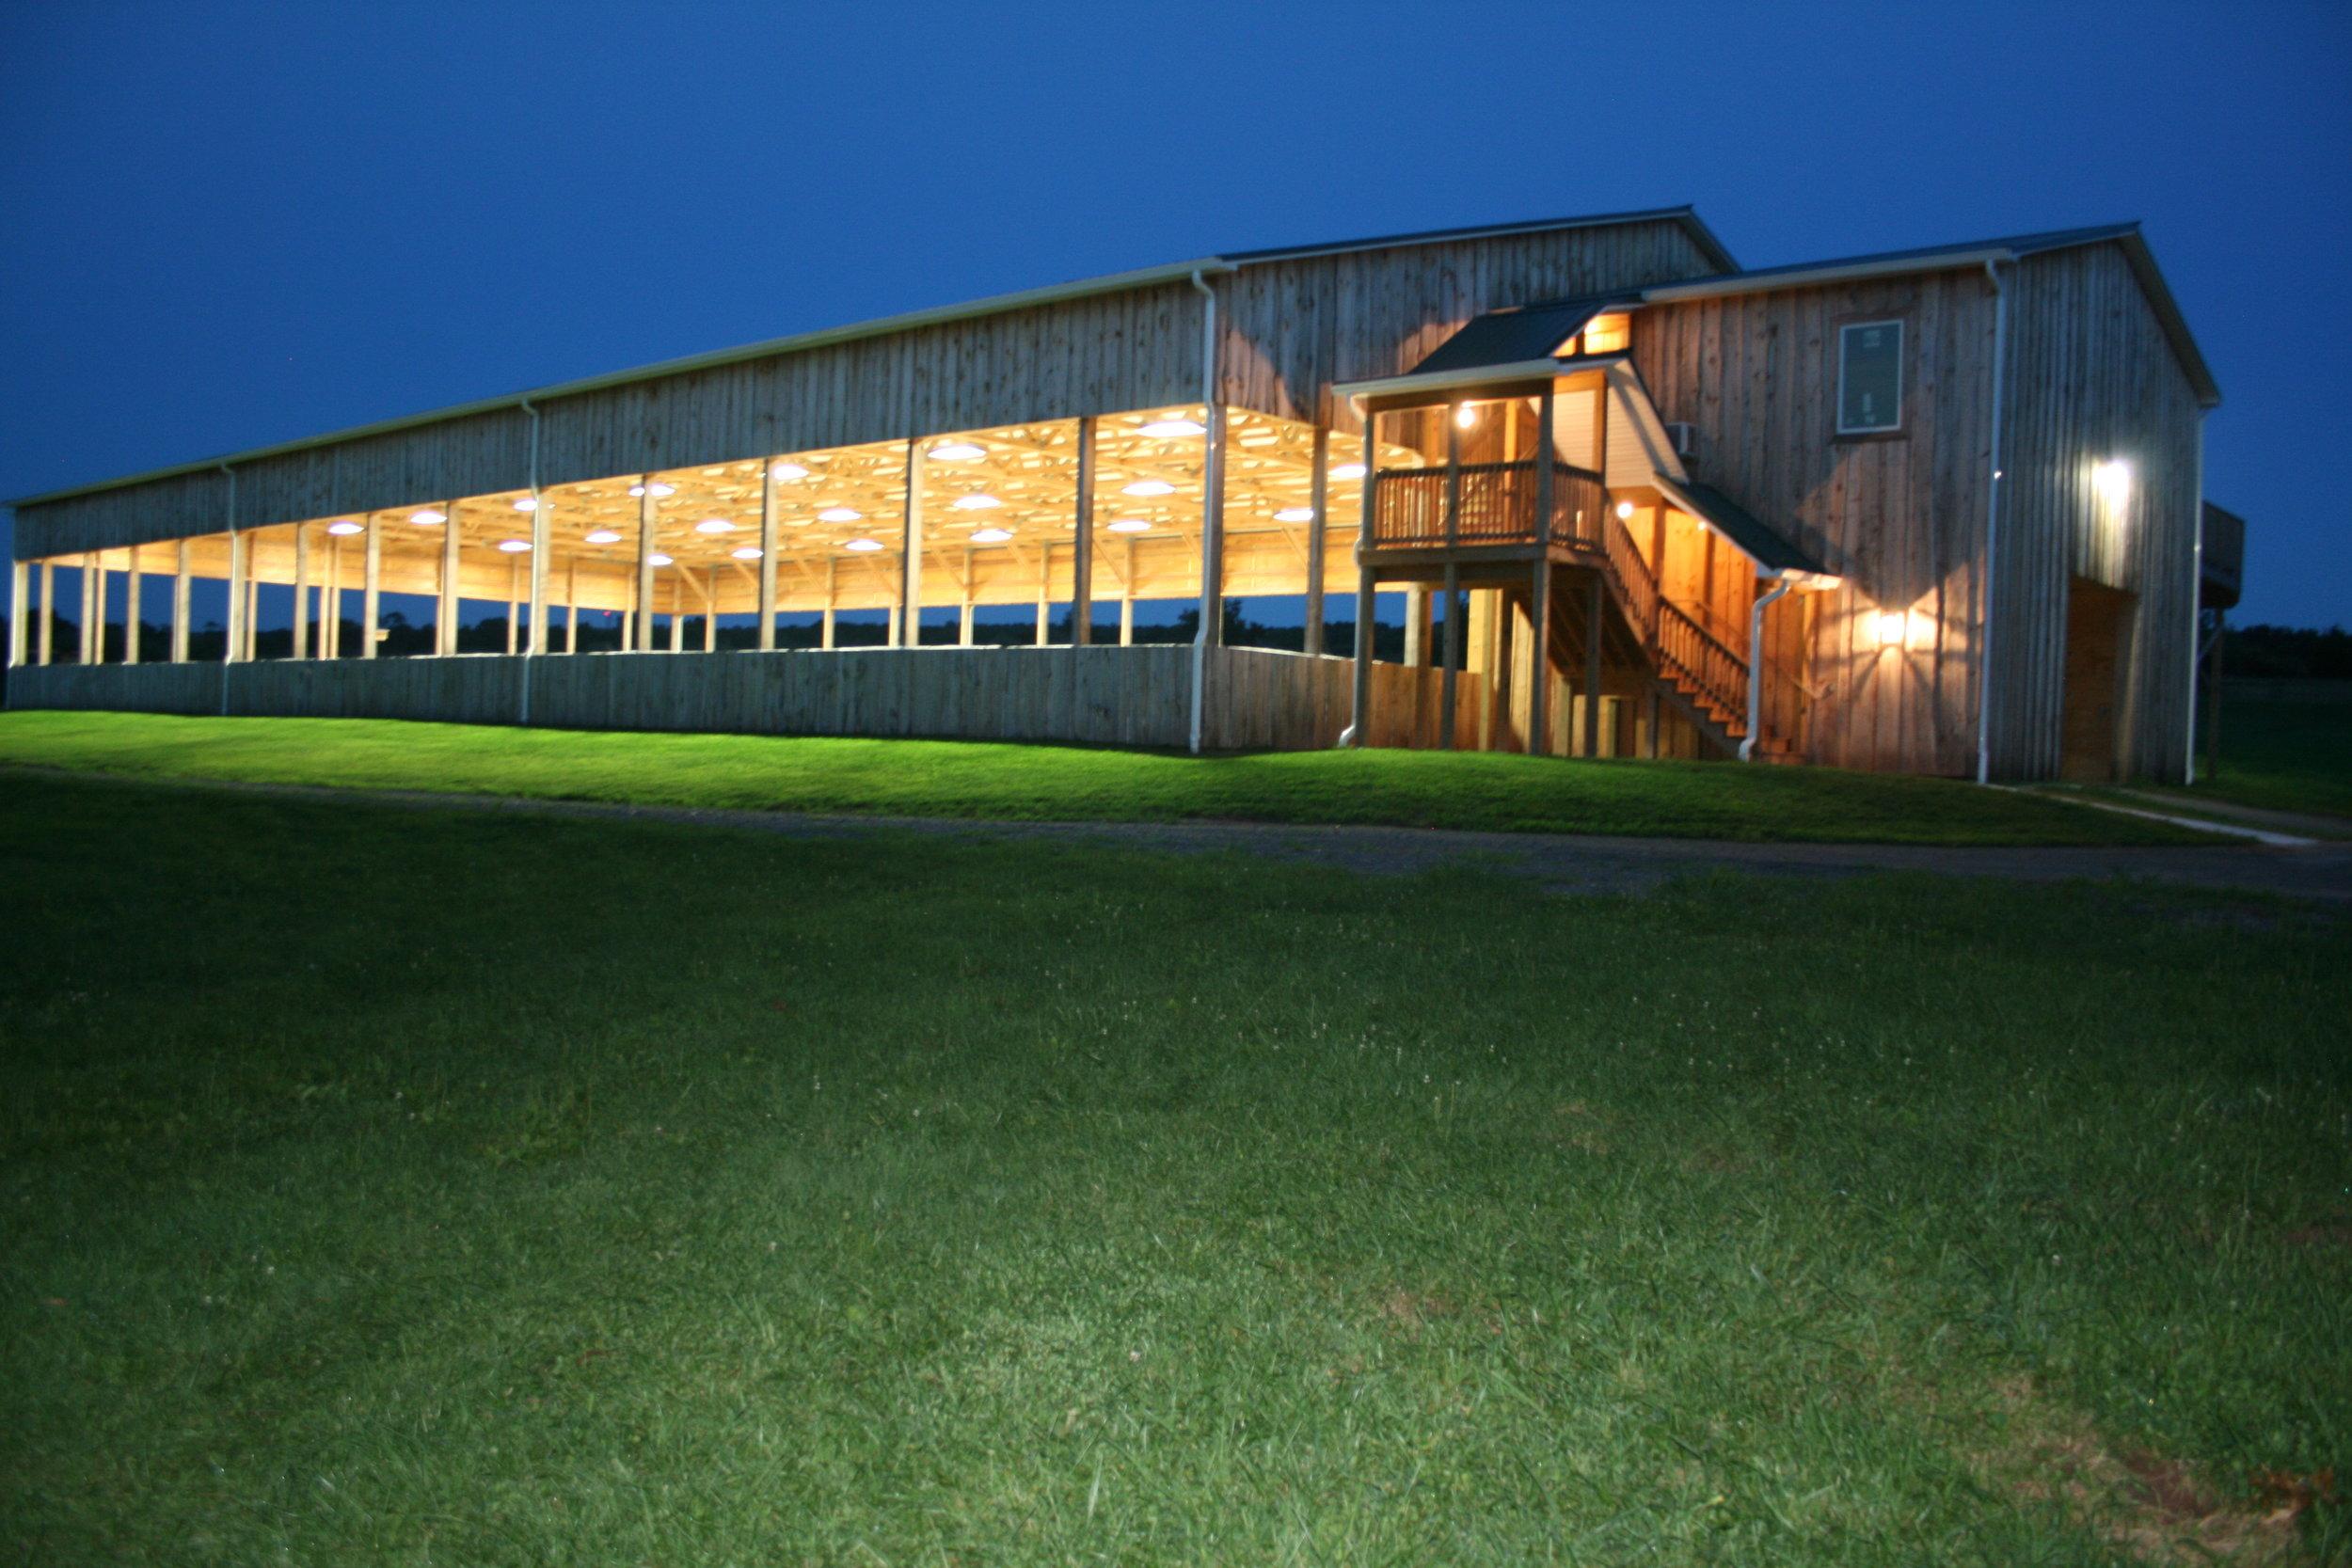 Misty Hollow Horse Farm /HORSE BOARDING FACILITY / Hillsborough, NJ